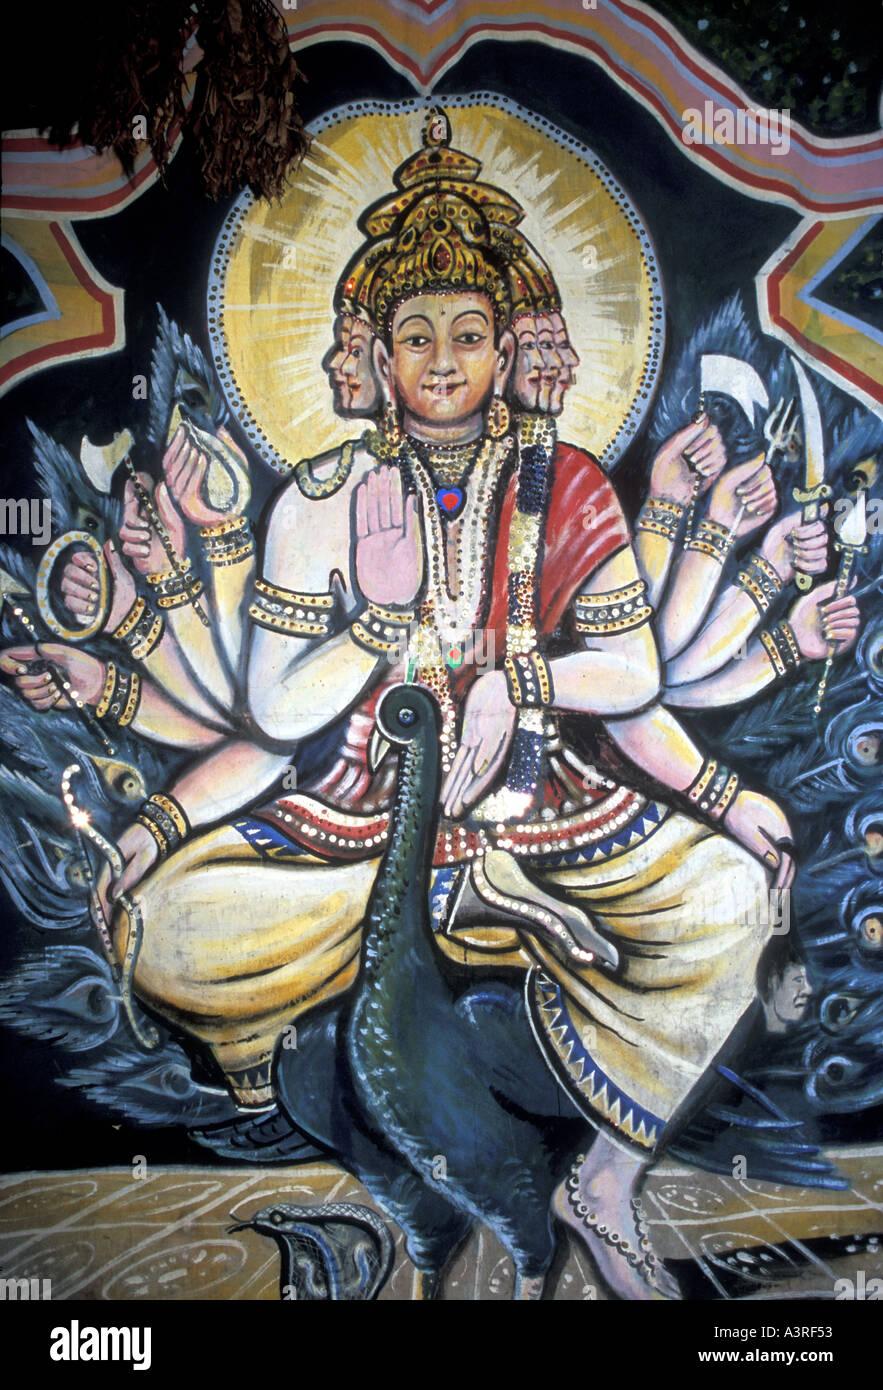 HINDUISM Lord Vishnu creator and guardian of the Universe - Stock Image